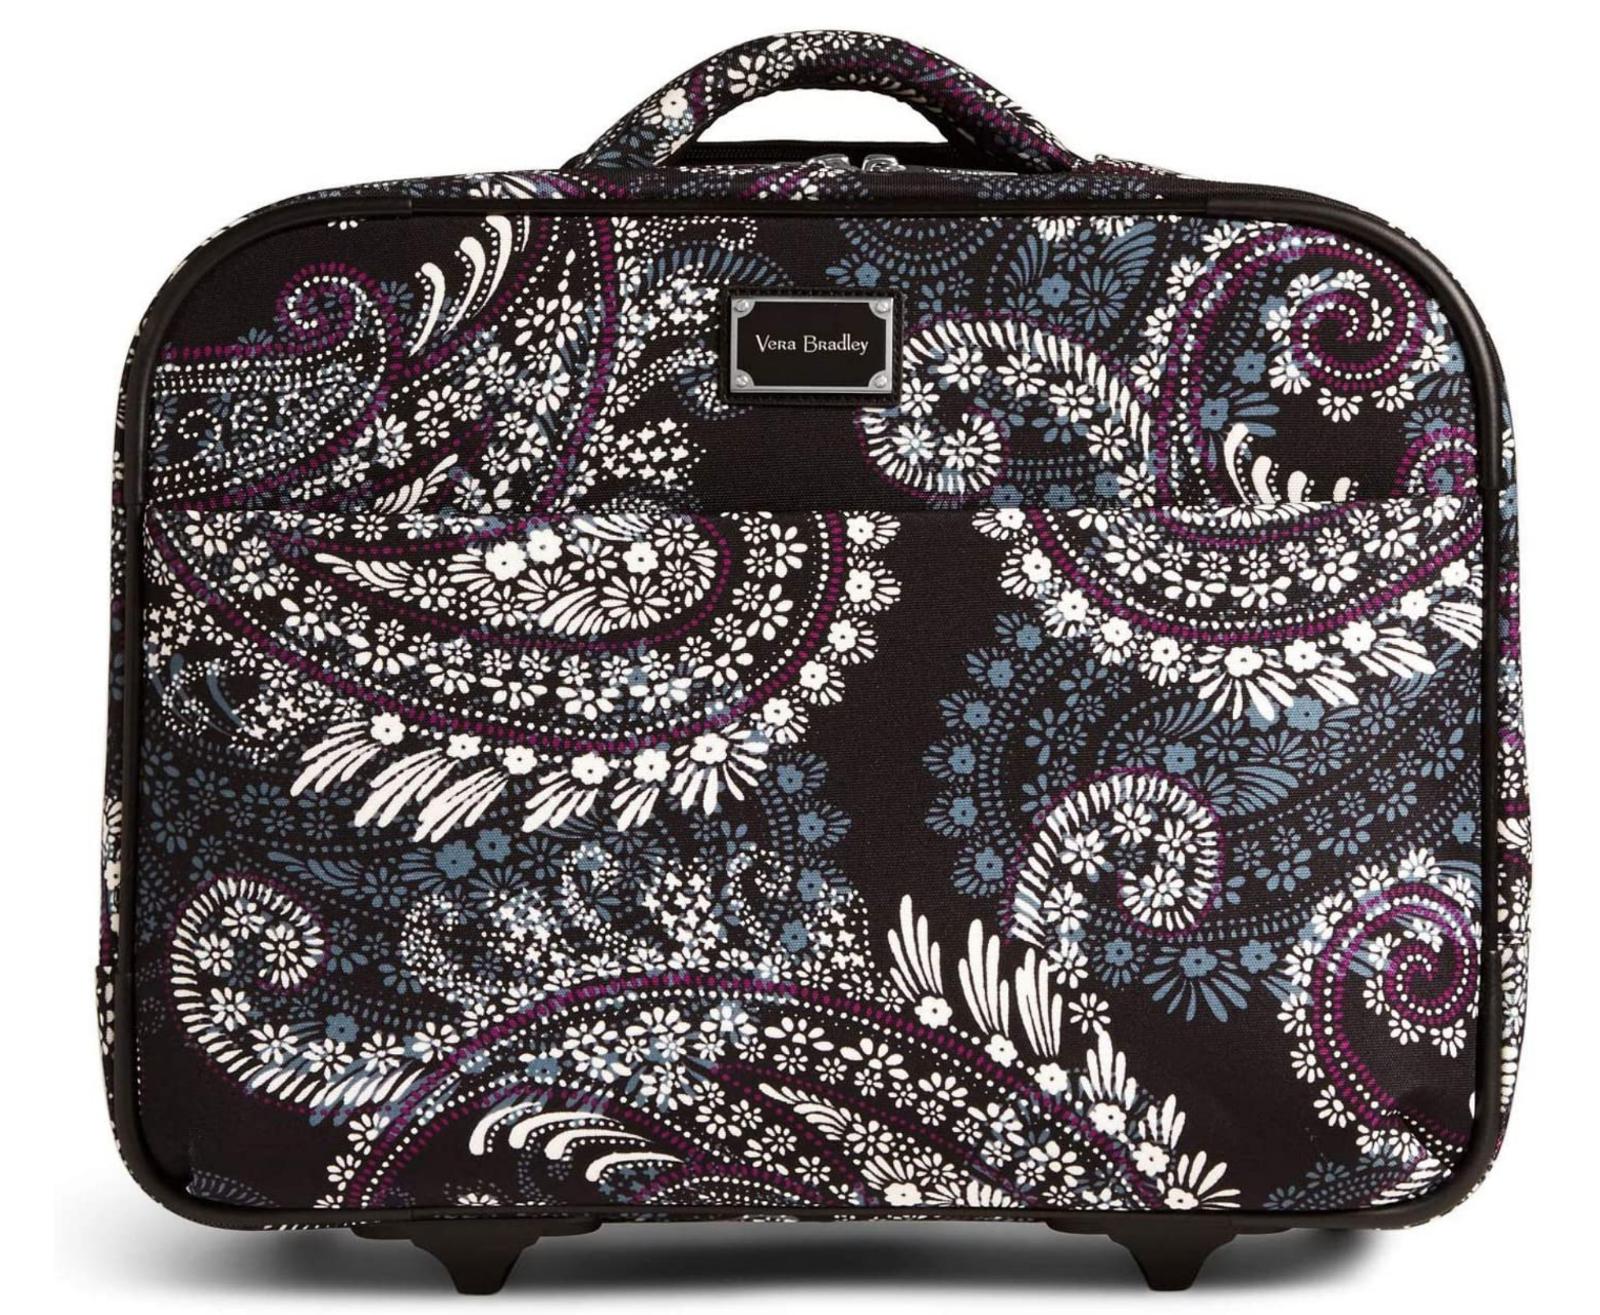 Vera Bradley On a Roll Laptop Work Travel Bag Wheels Paisley Petals - $220 - $138.55